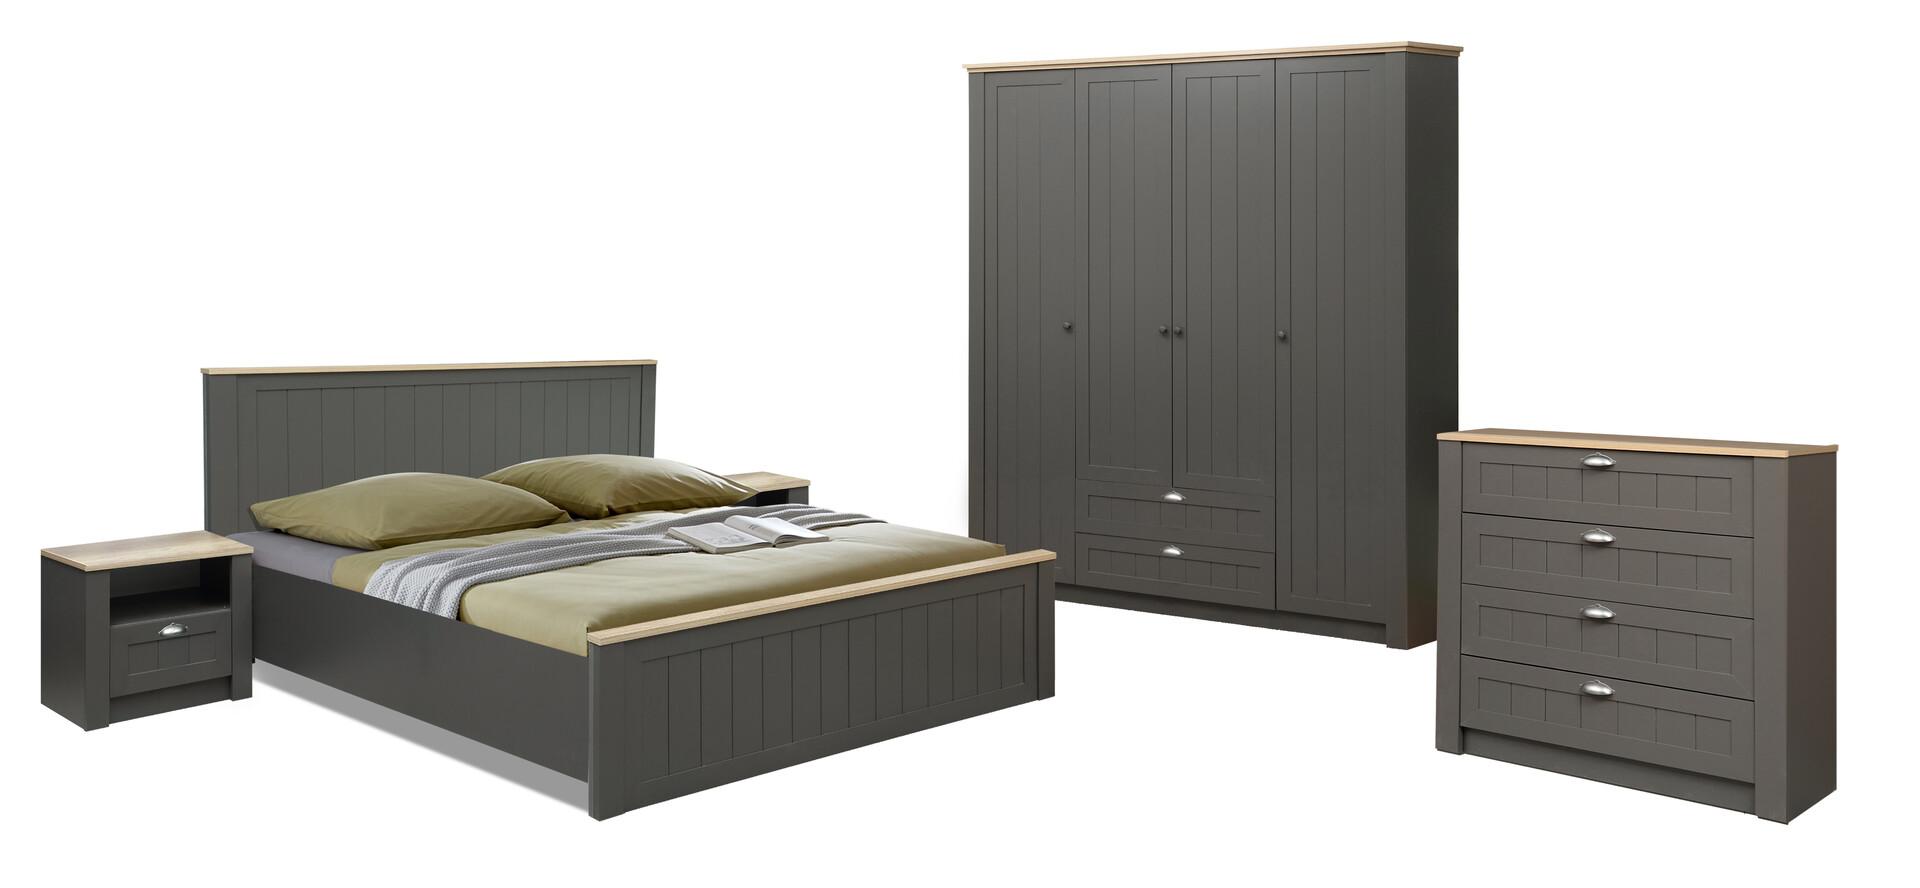 Комплект мебели для спальни Прованс (диамант серый/ дуб каньон)